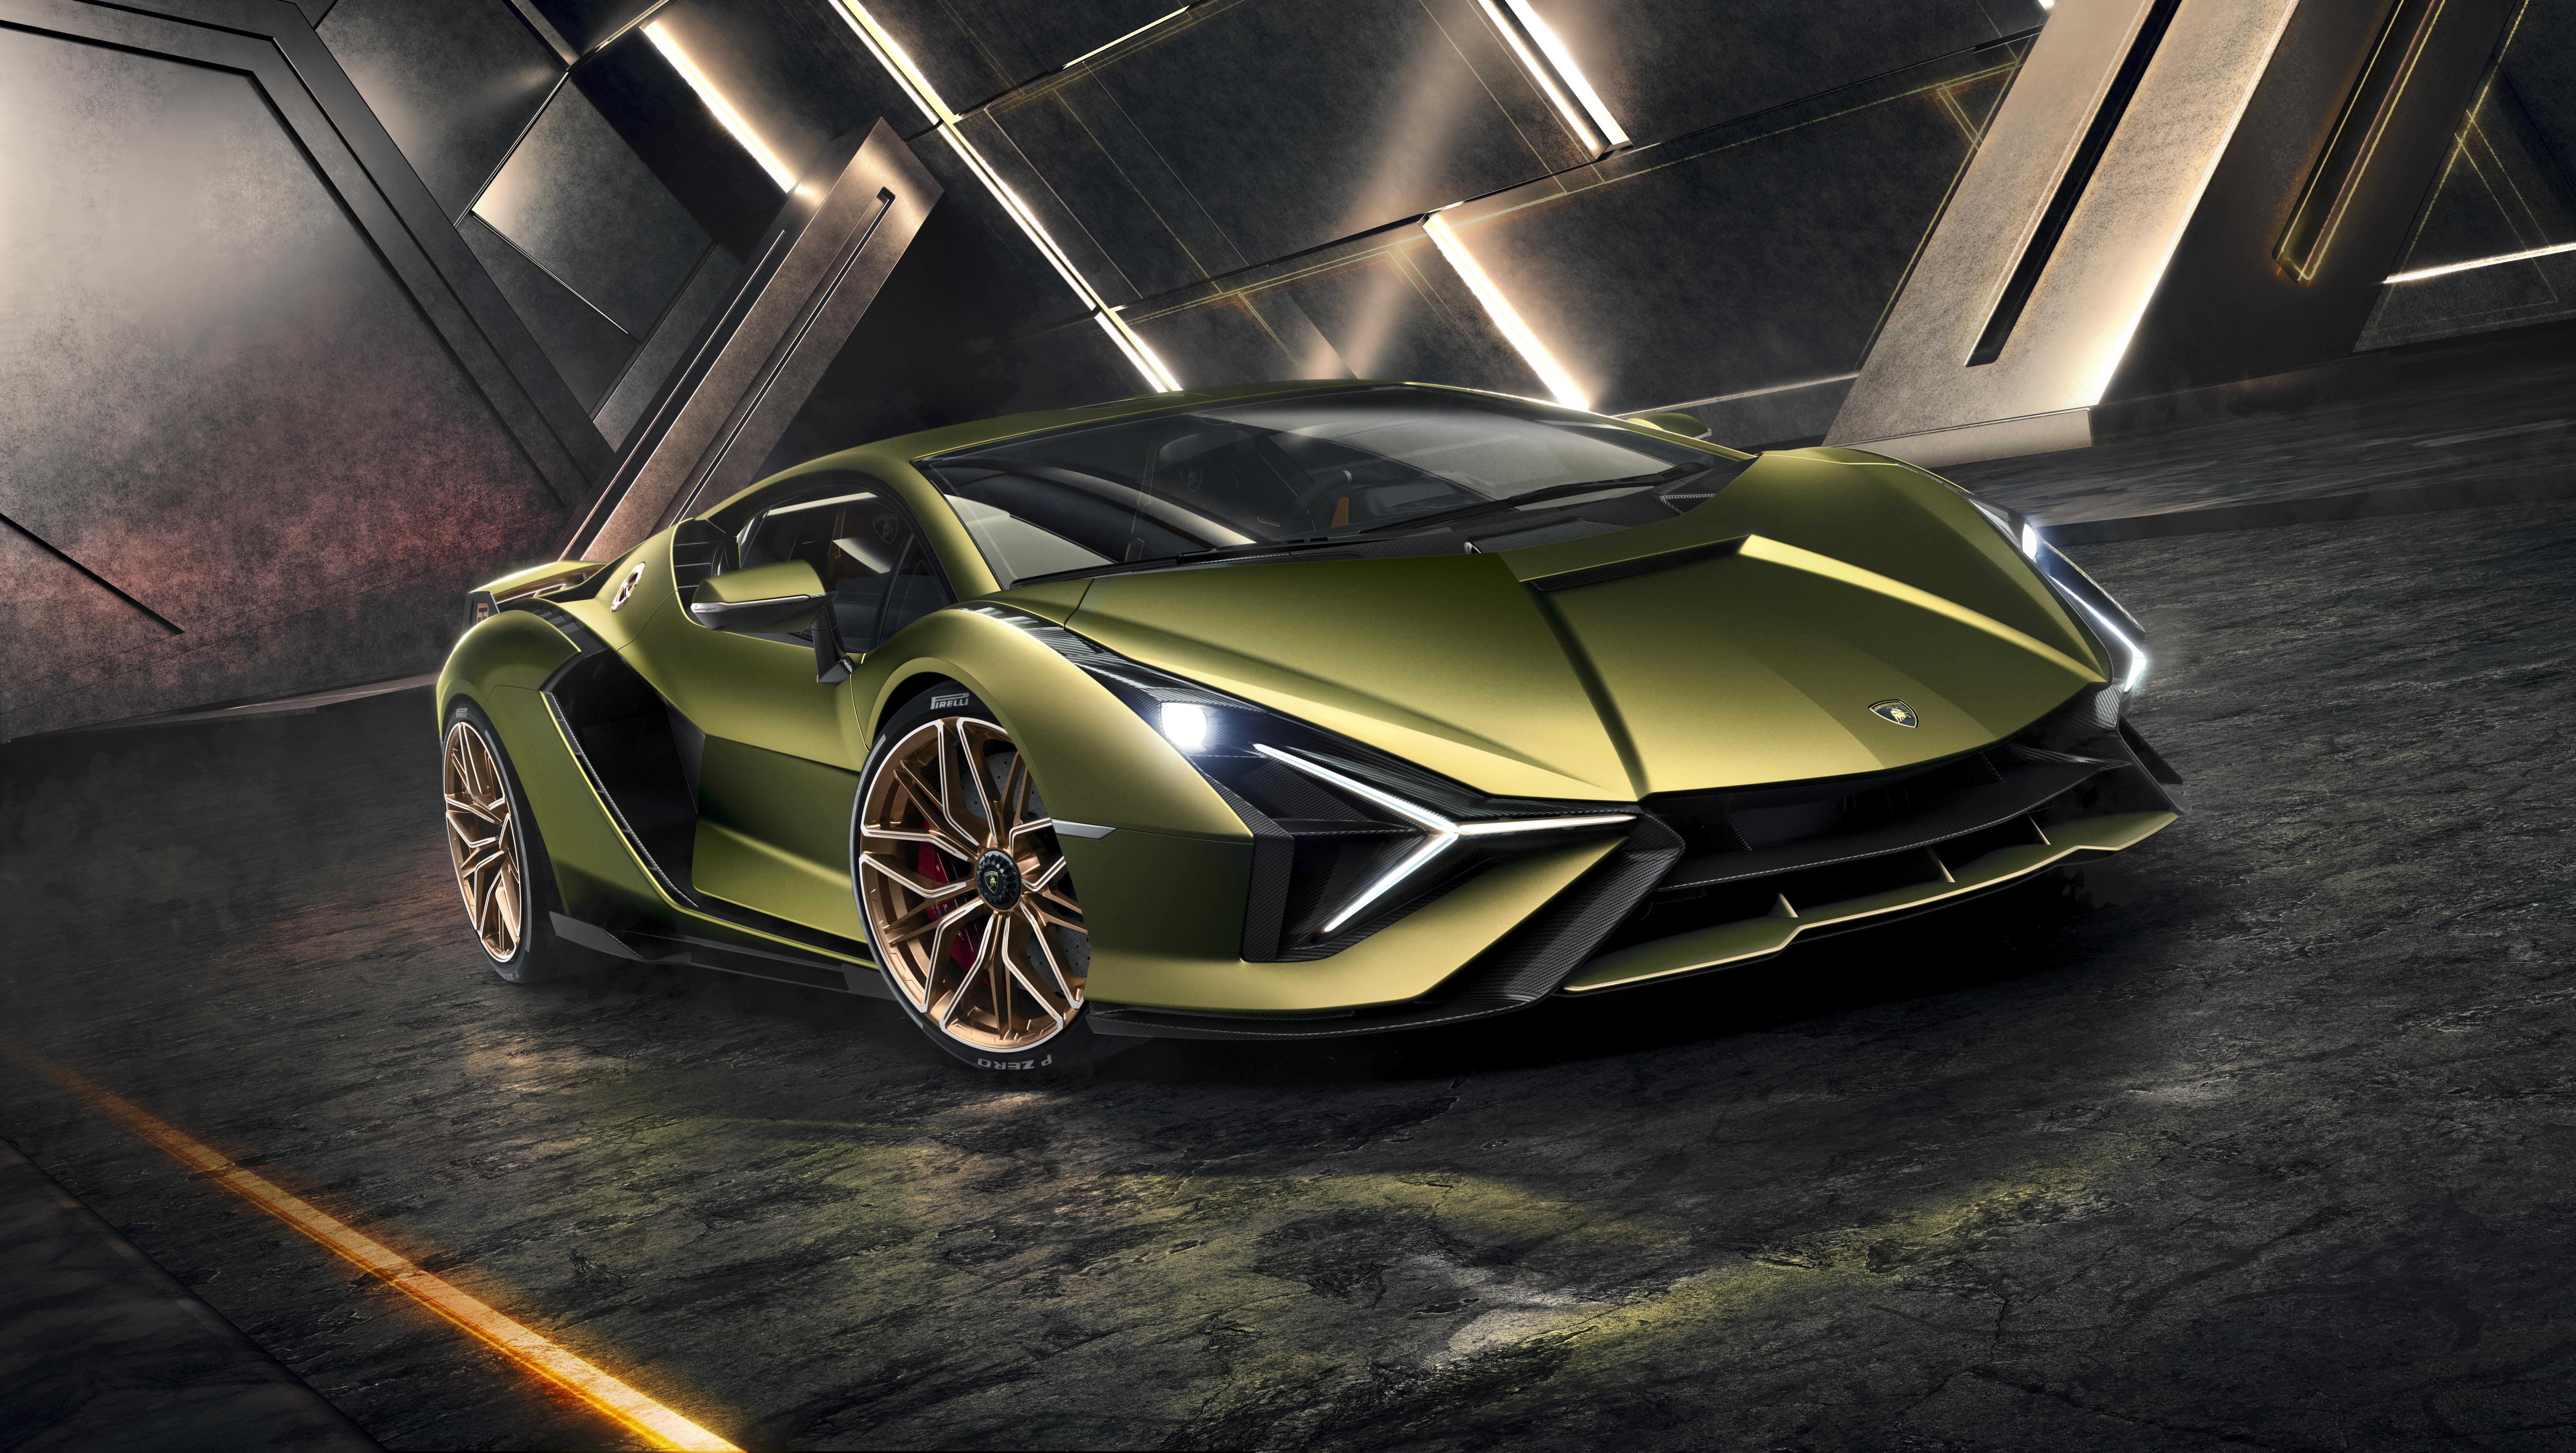 Lamborghini reveals its first hybrid supercar The Sian